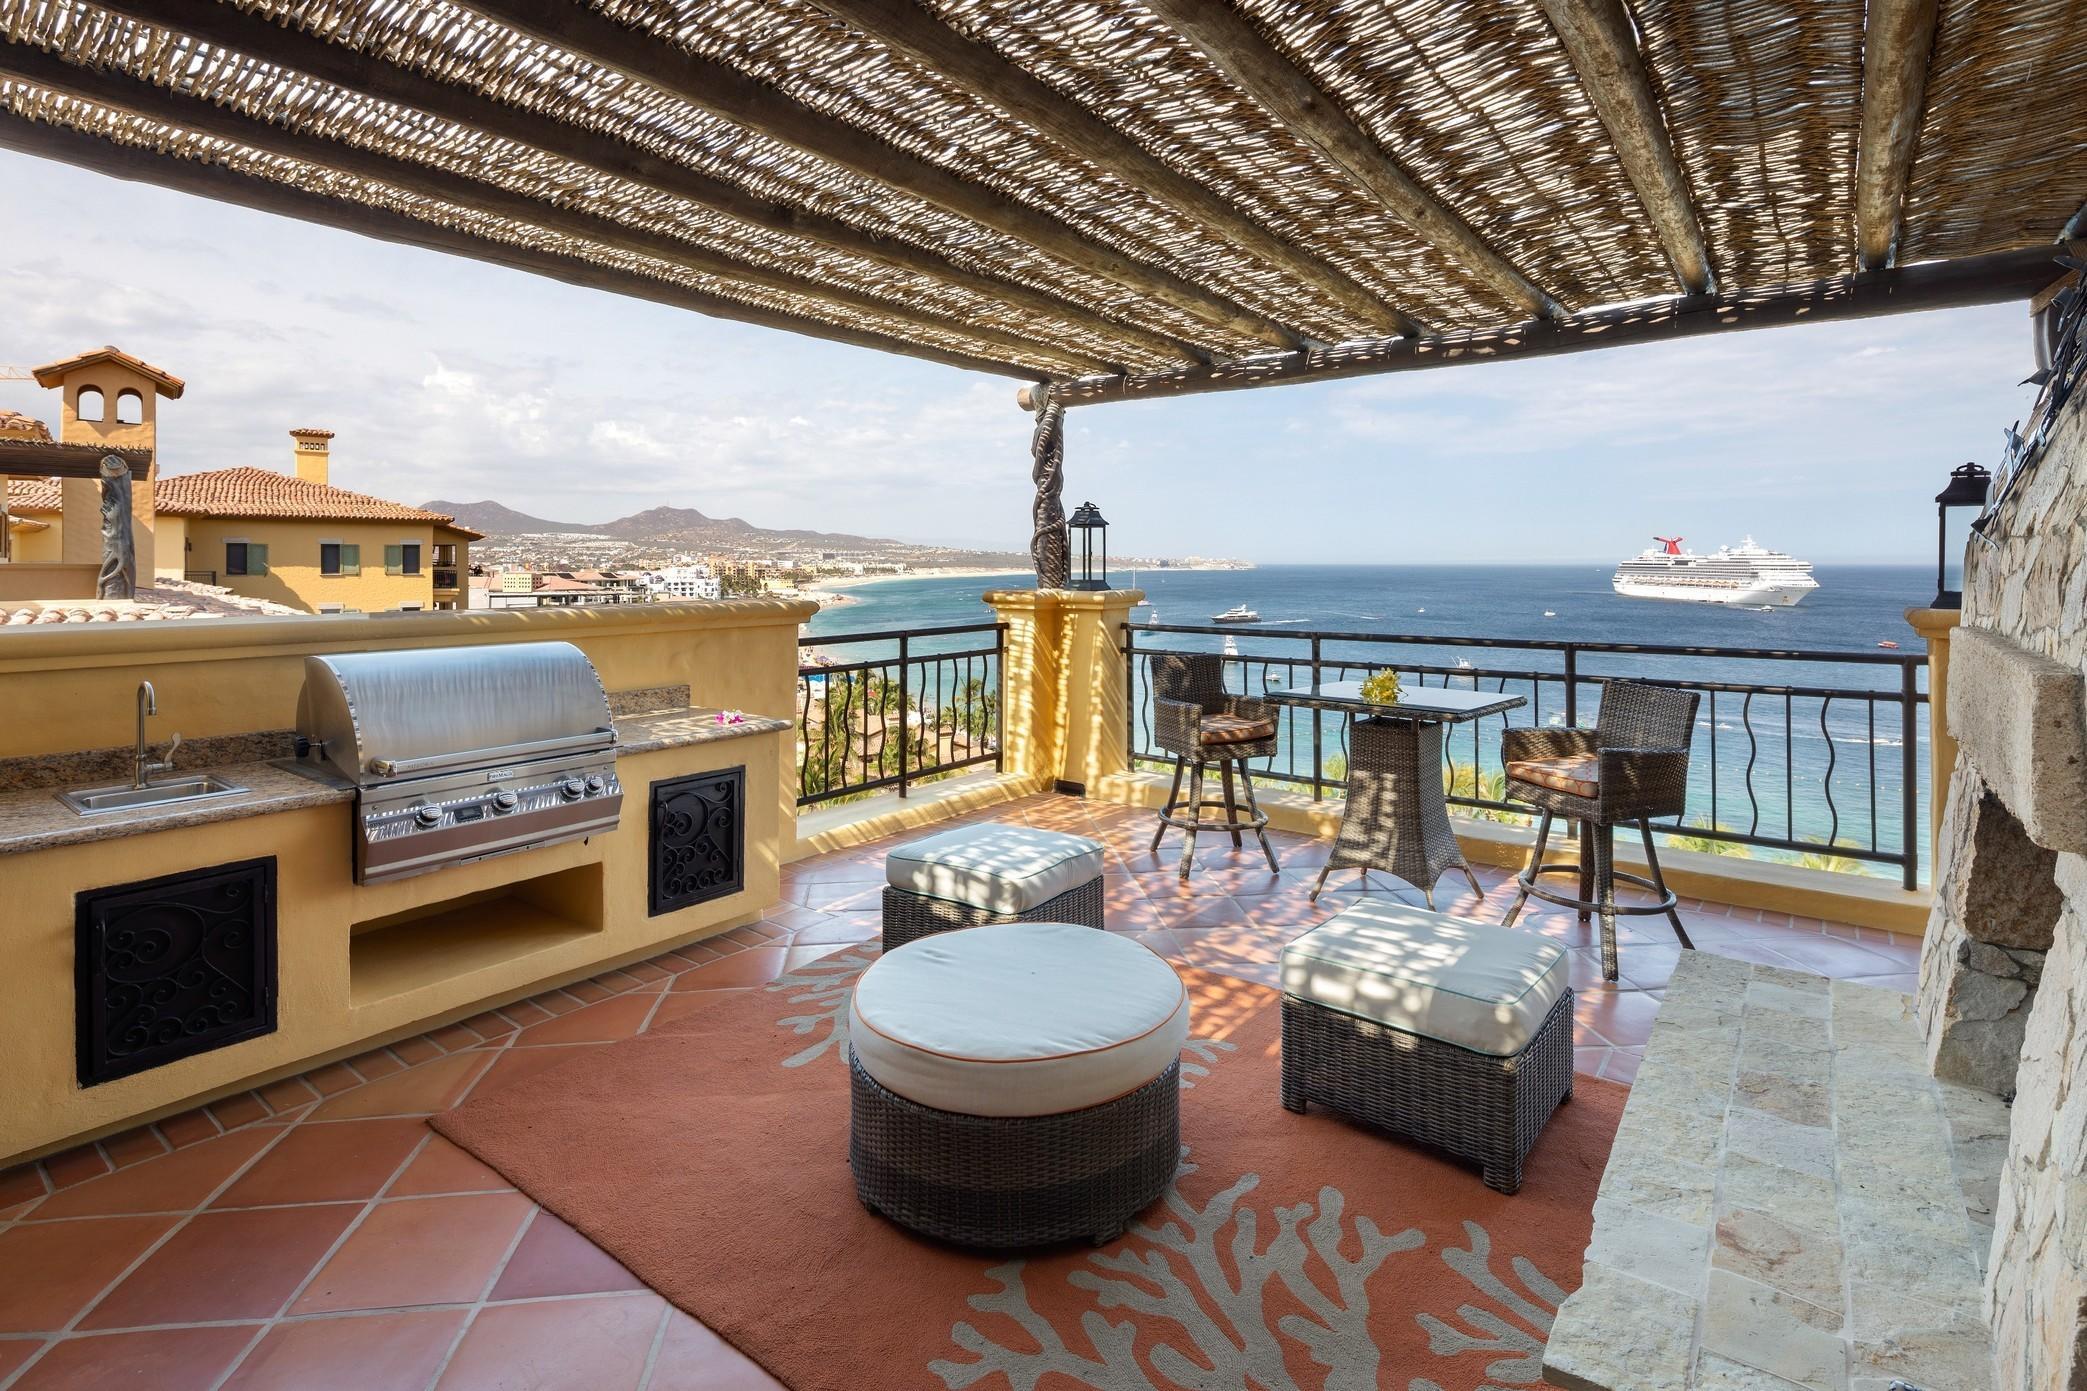 Hacienda Beach Club & Residences, Cabo San Lucas